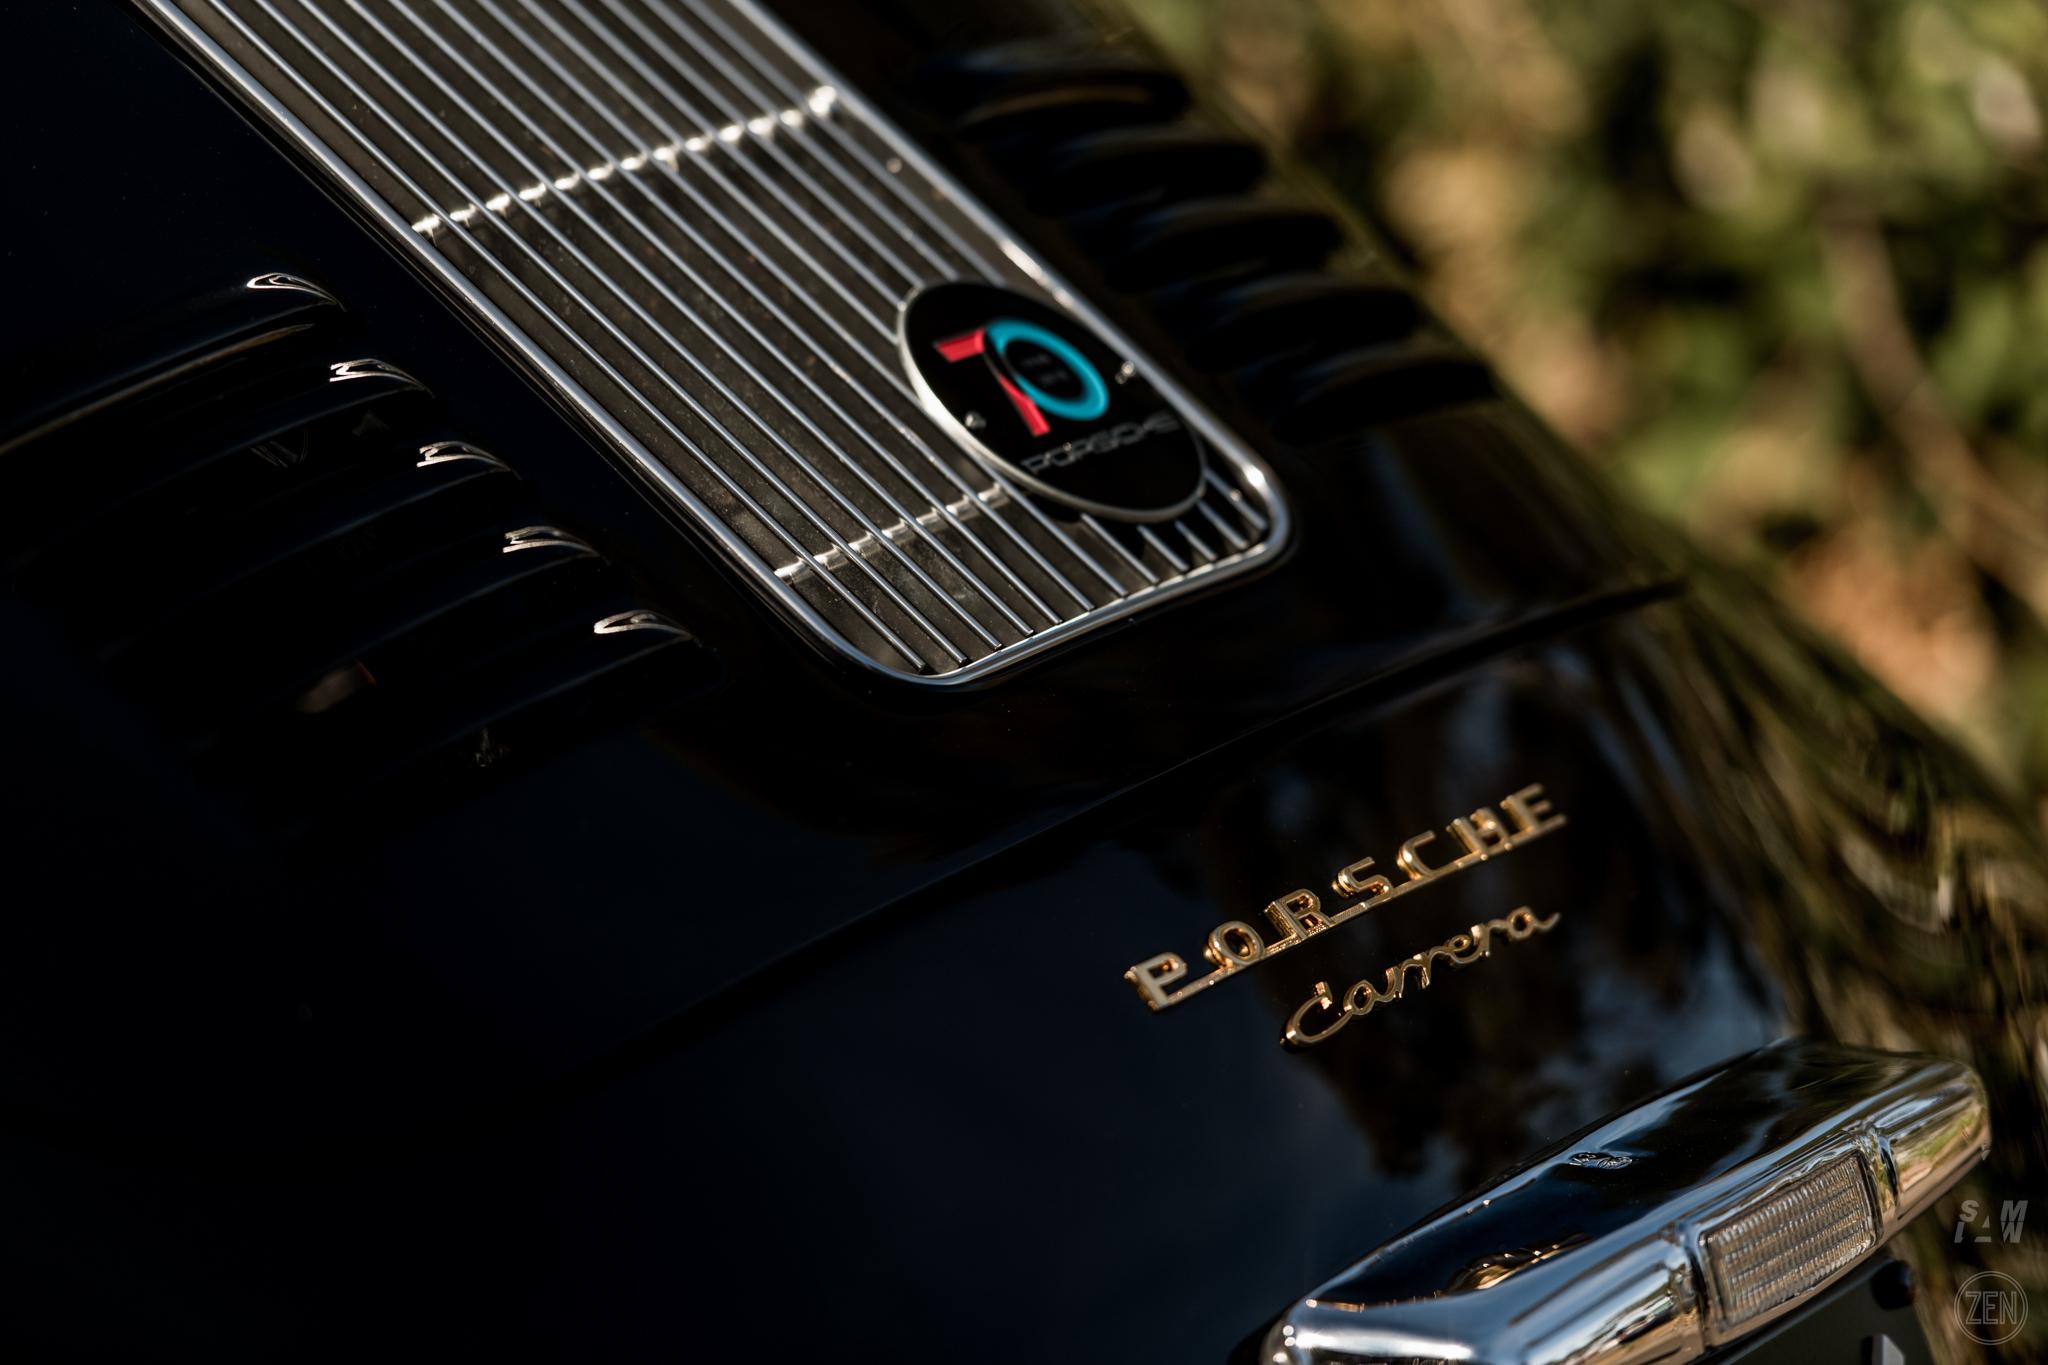 2019-10-27 - Autohaus Porsches & Coffee 170